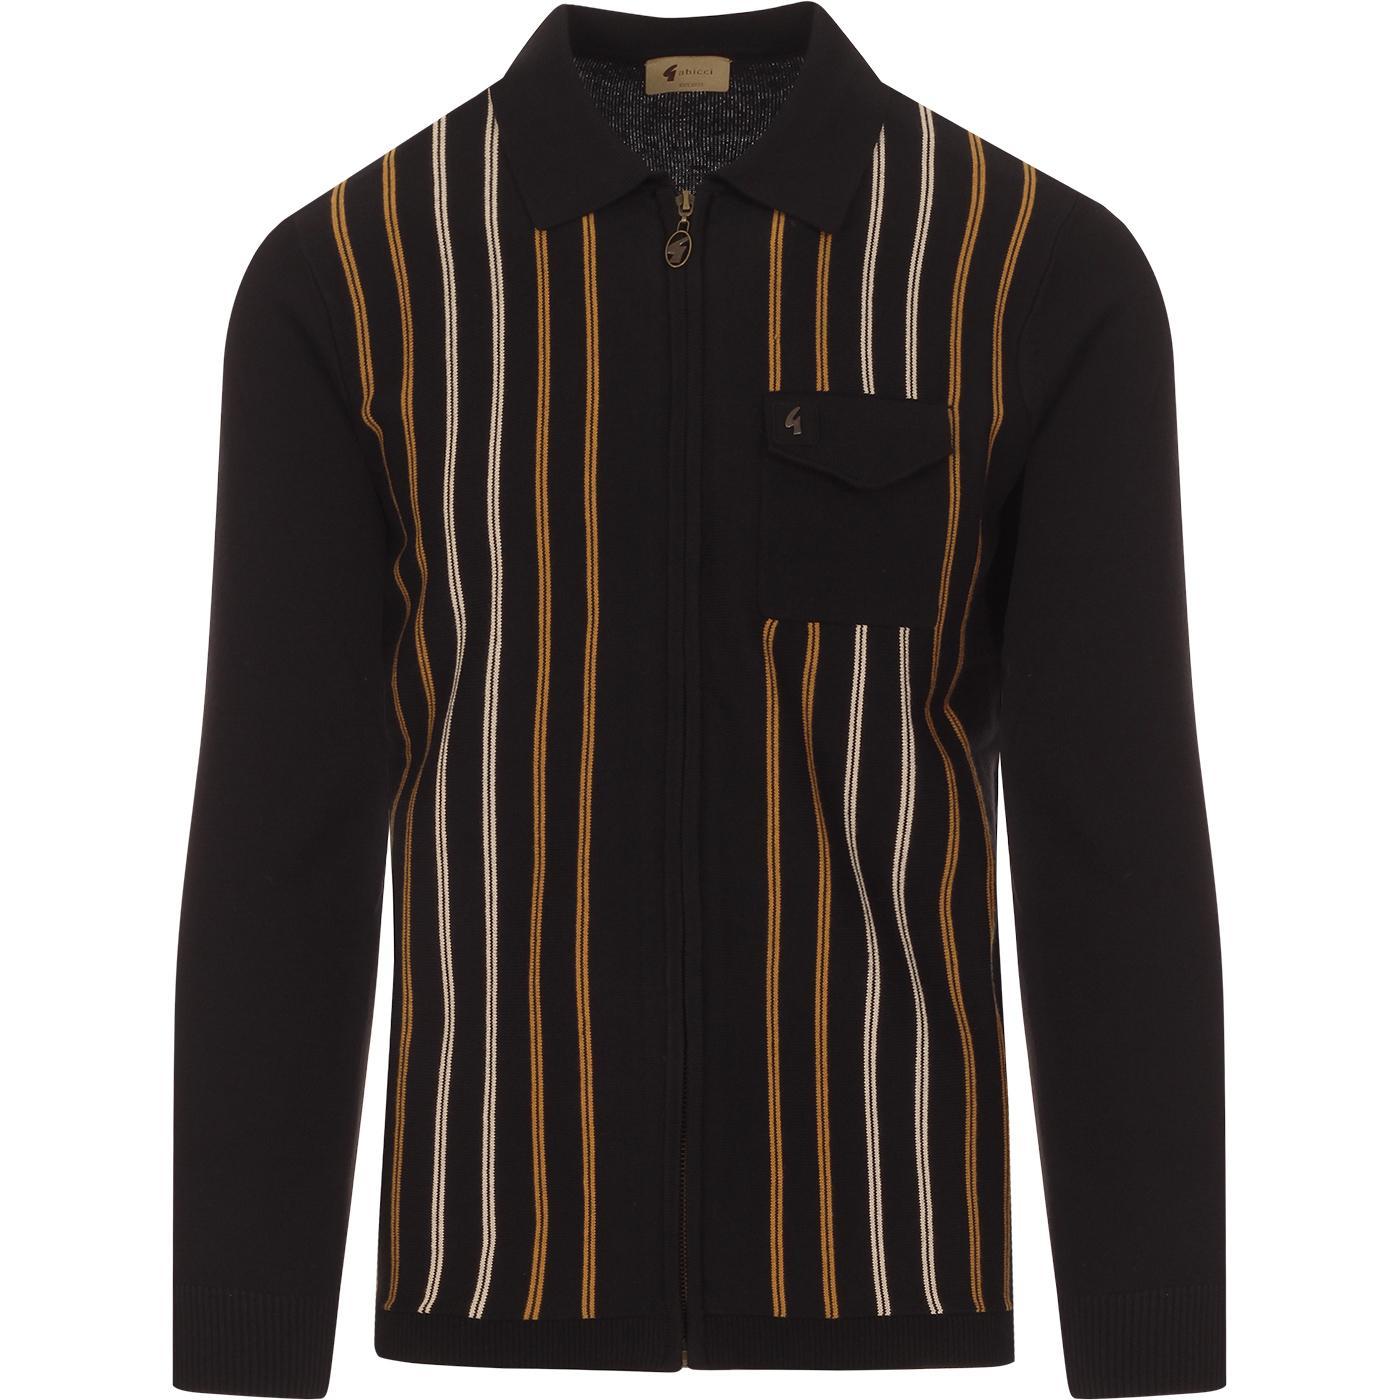 Device GABICCI VINTAGE Stripe Zip Polo Cardigan